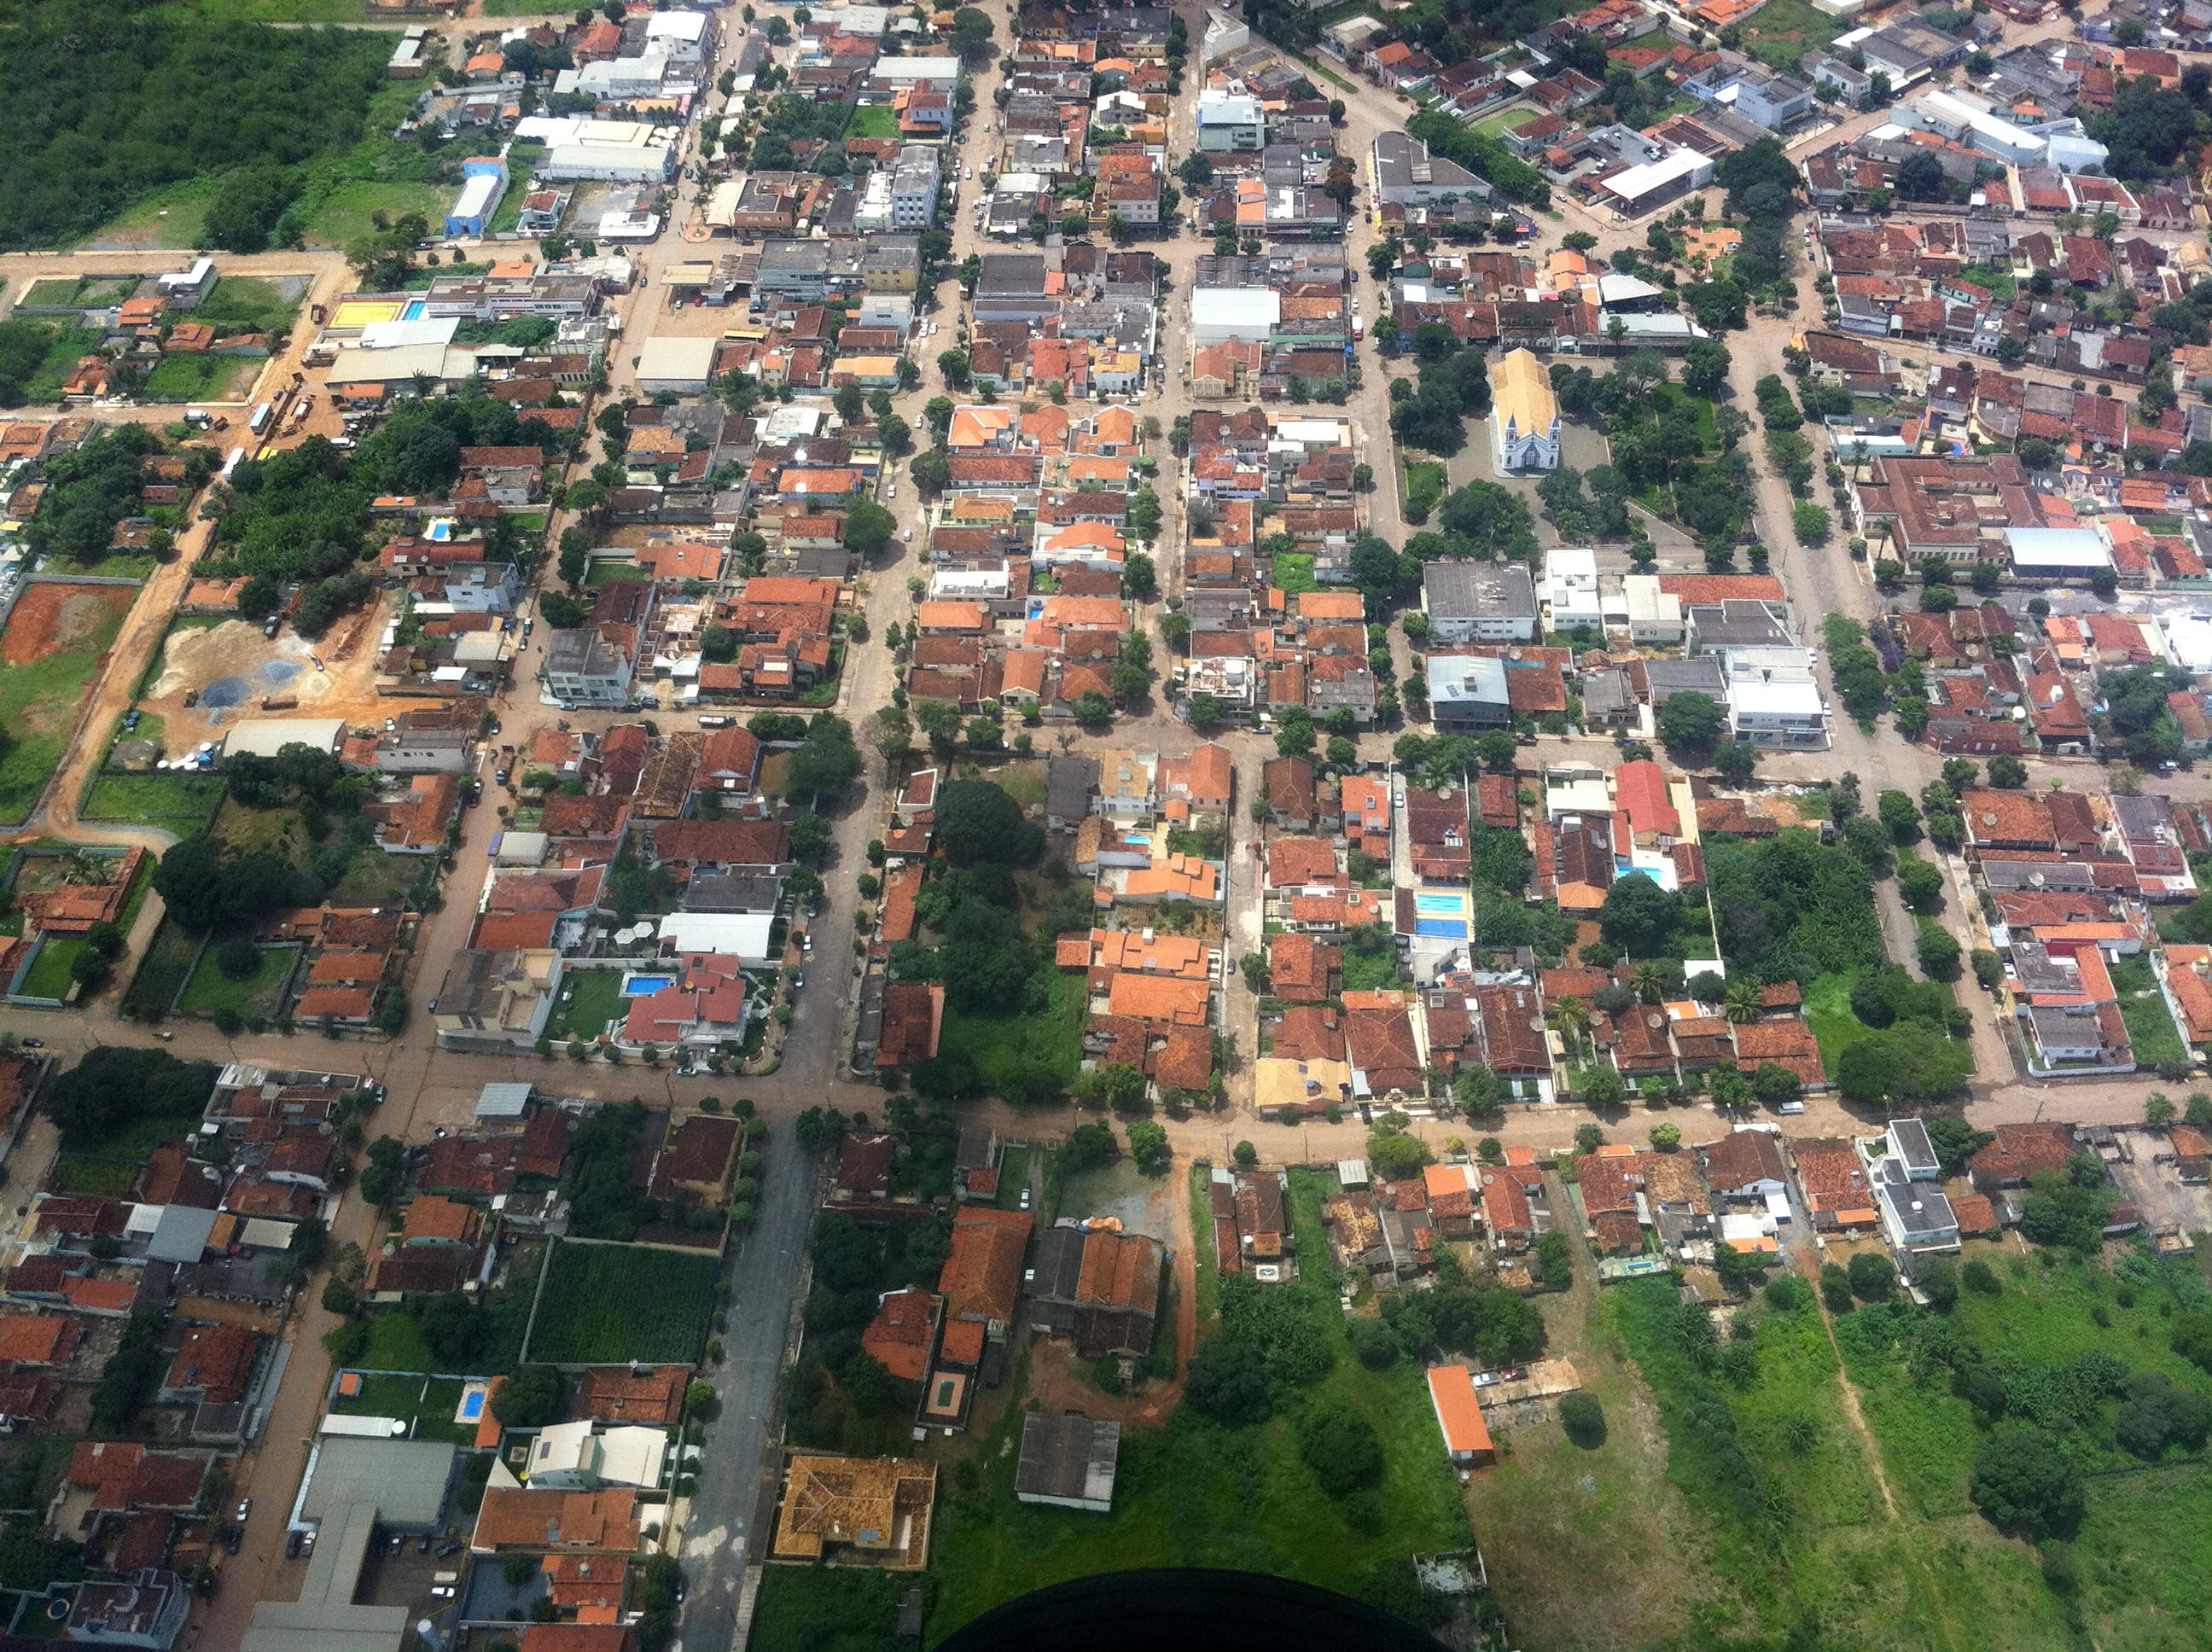 Indaiabira Minas Gerais fonte: upload.wikimedia.org